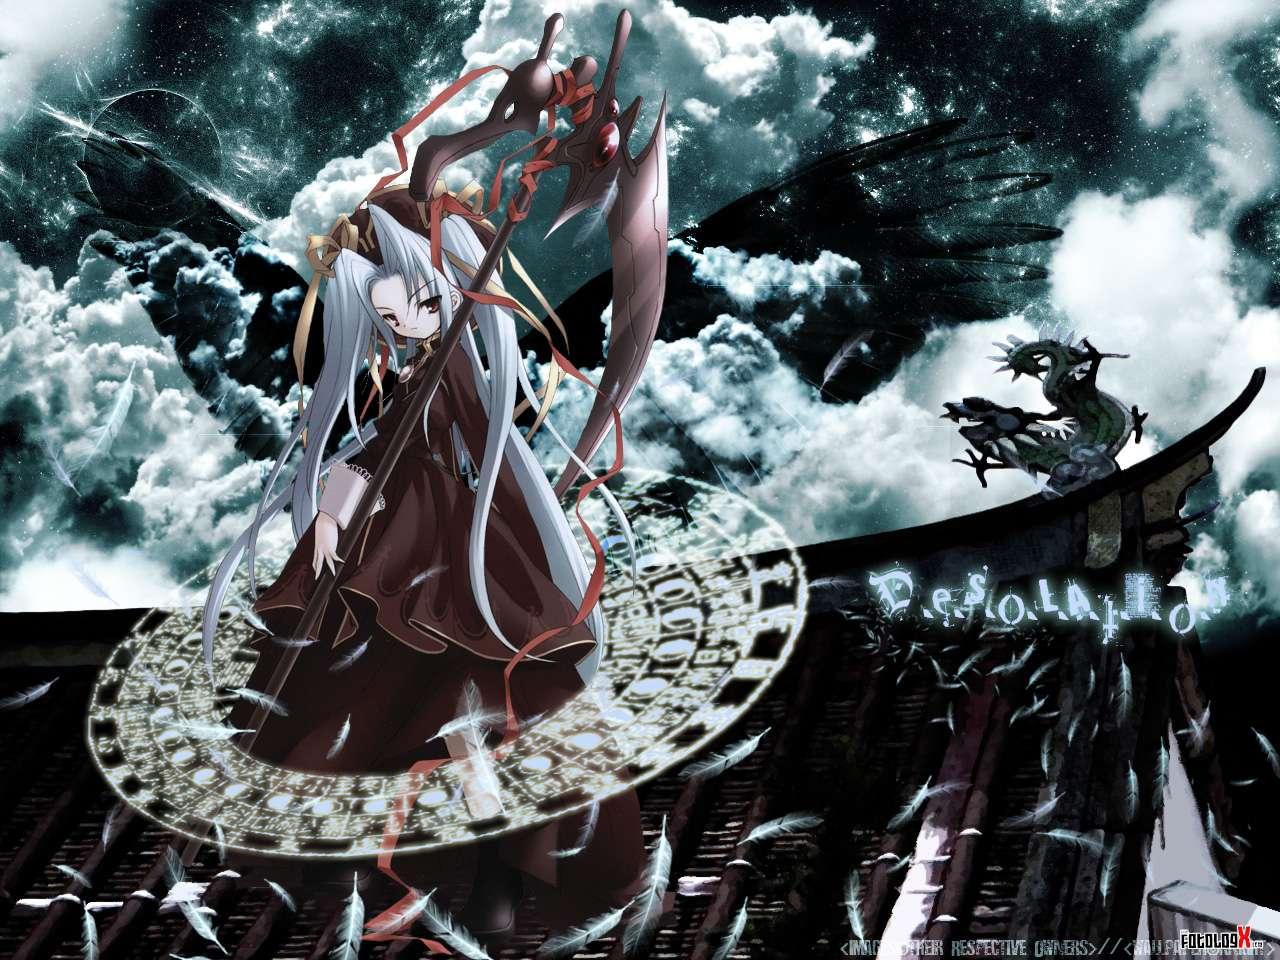 Wallpapers de anime Xmen Kakashi y otros 1280x960